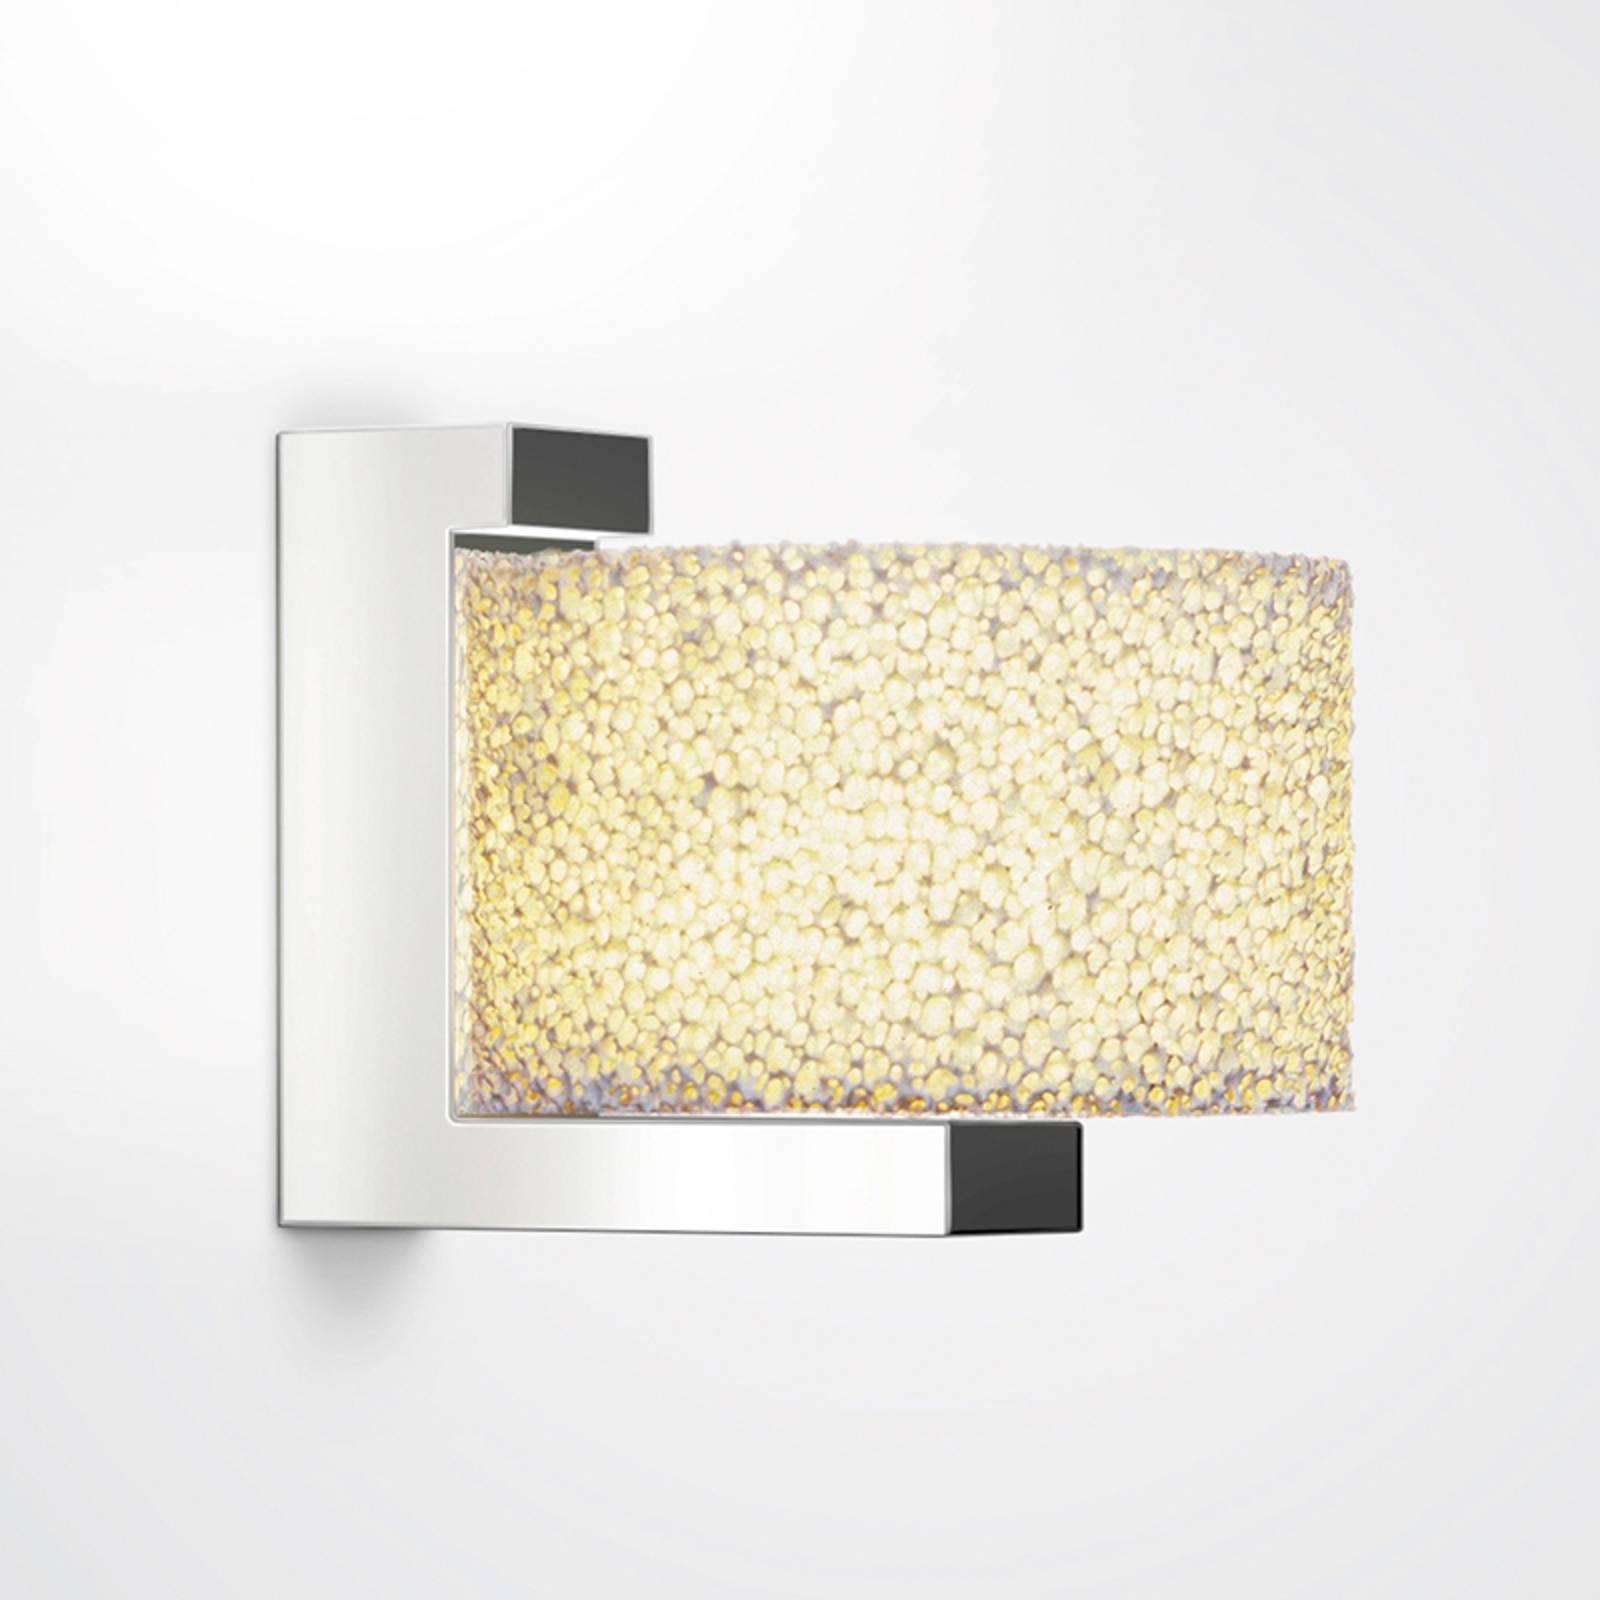 Wandlamp Reef van keramisch schuim, dimbare LED's